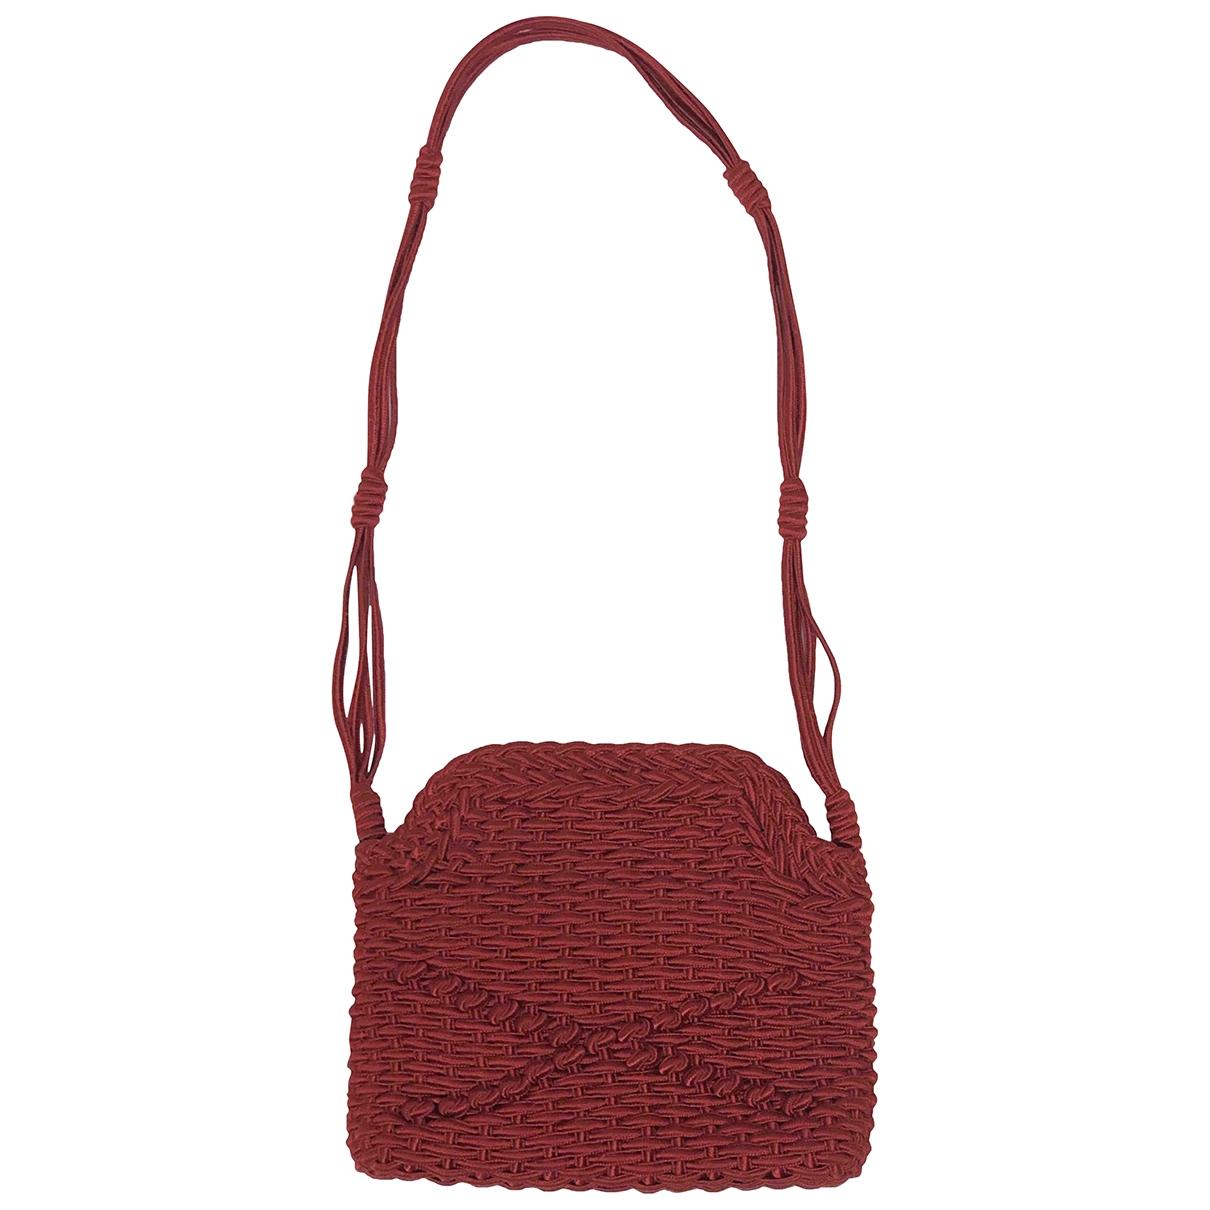 Alberta Ferretti \N Handtasche in  Rot Baumwolle